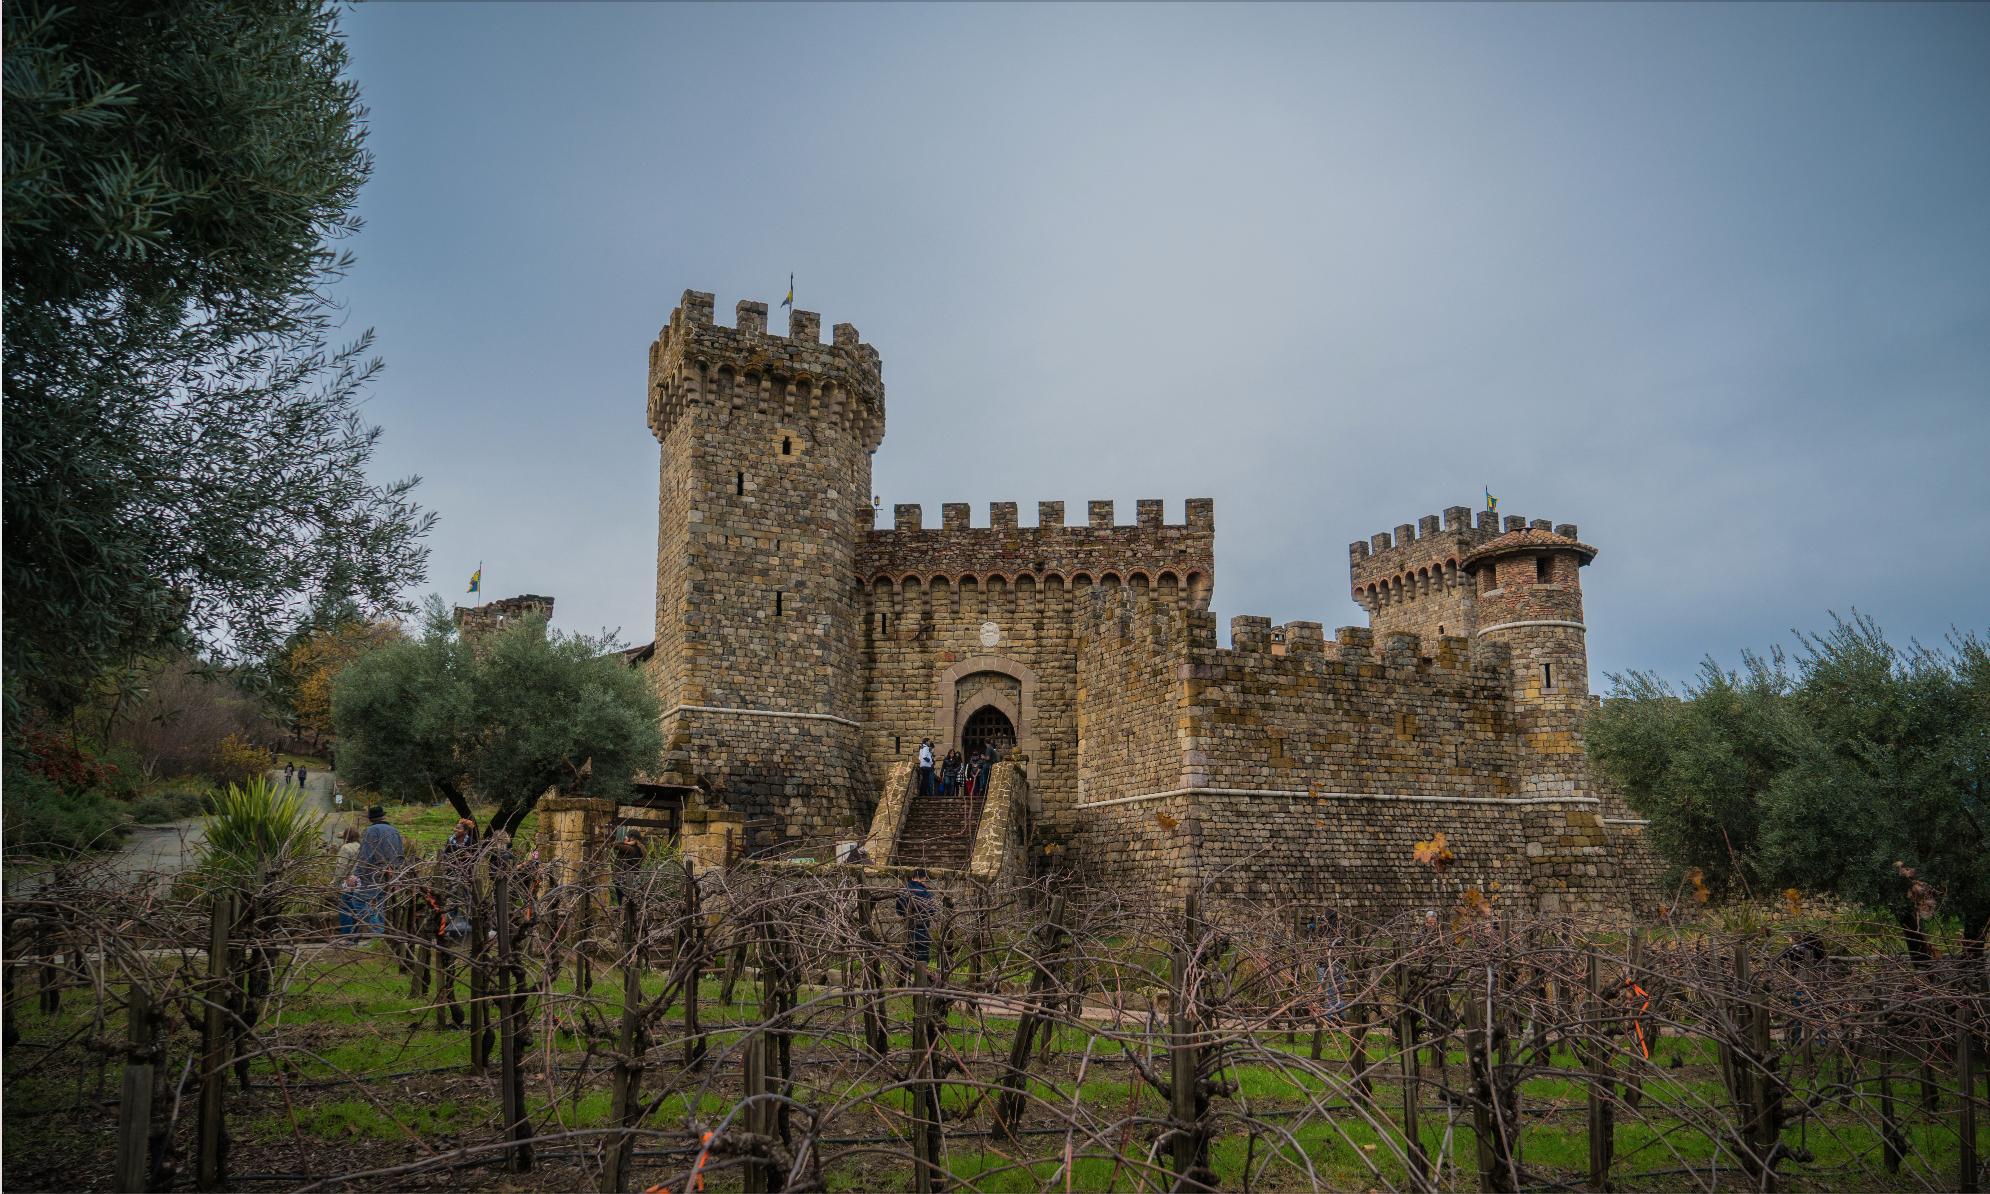 Castello Di Amorosa Vineyard Winery in Napa Valley, CA